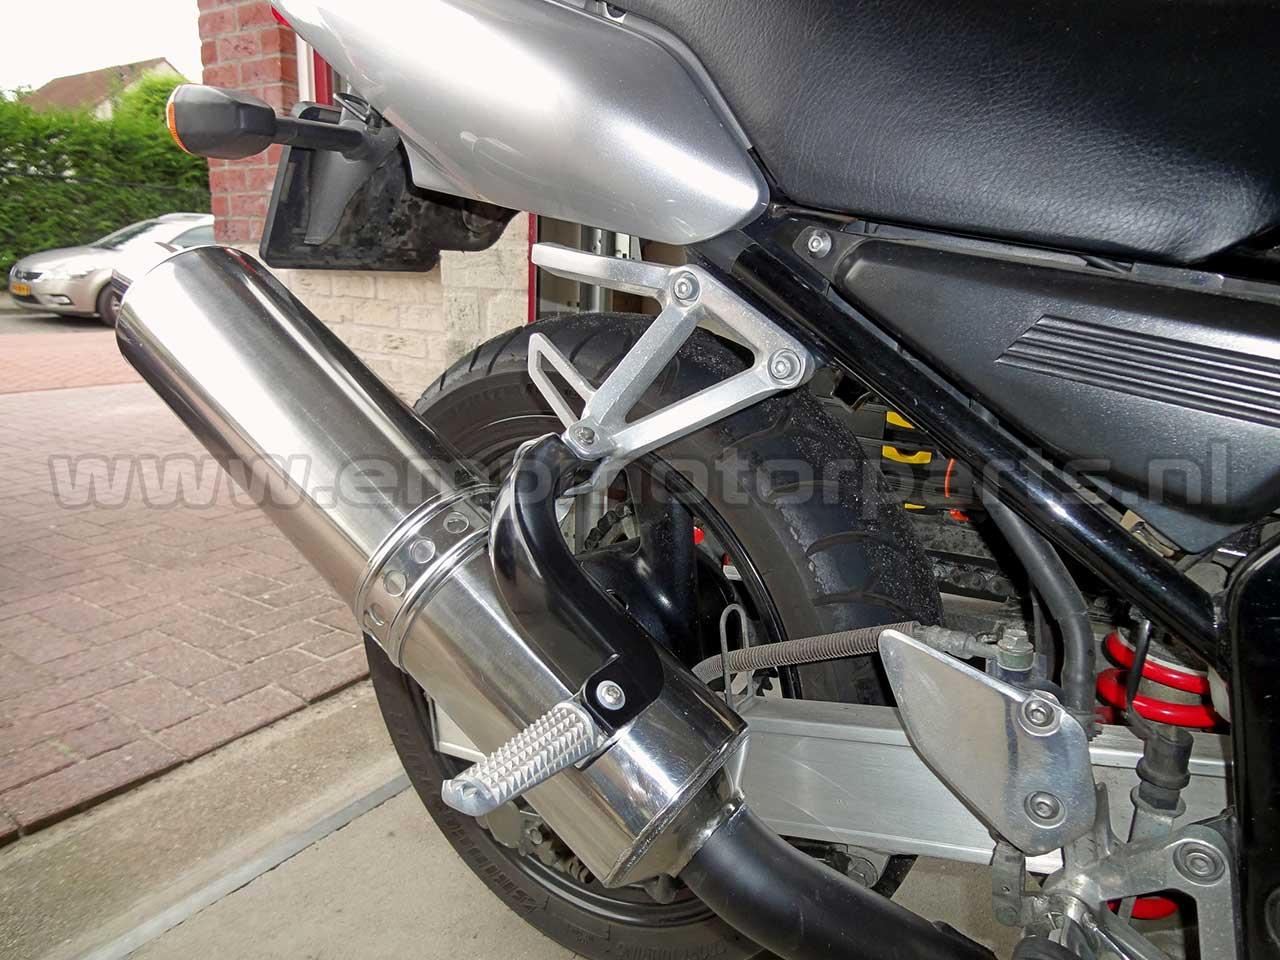 Yamaha Xvzat Parts